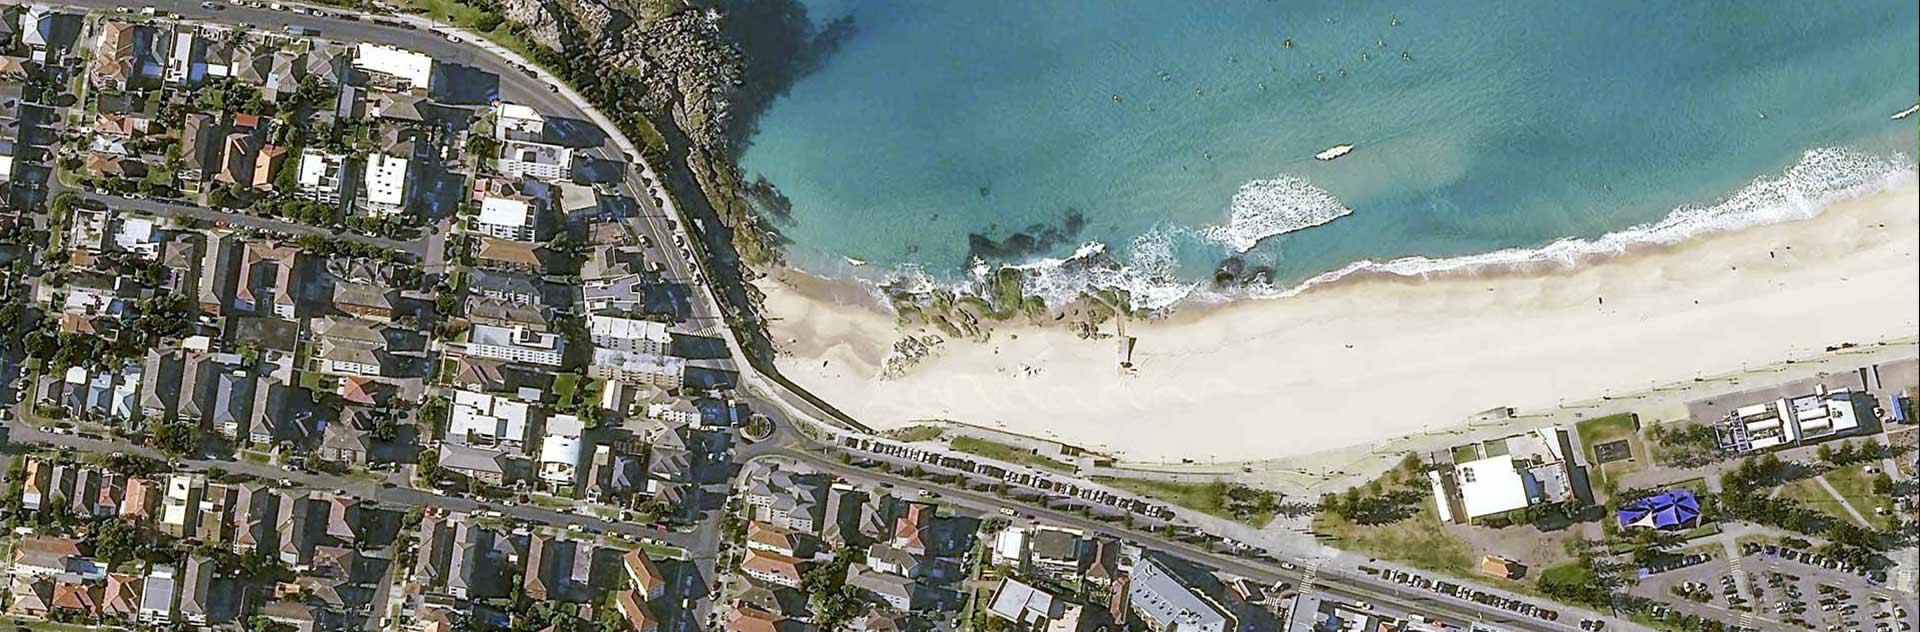 Sydney, Australia at 30cm resolution by Pléiades Neo 3 satellite, copyright Airbus DS 2021